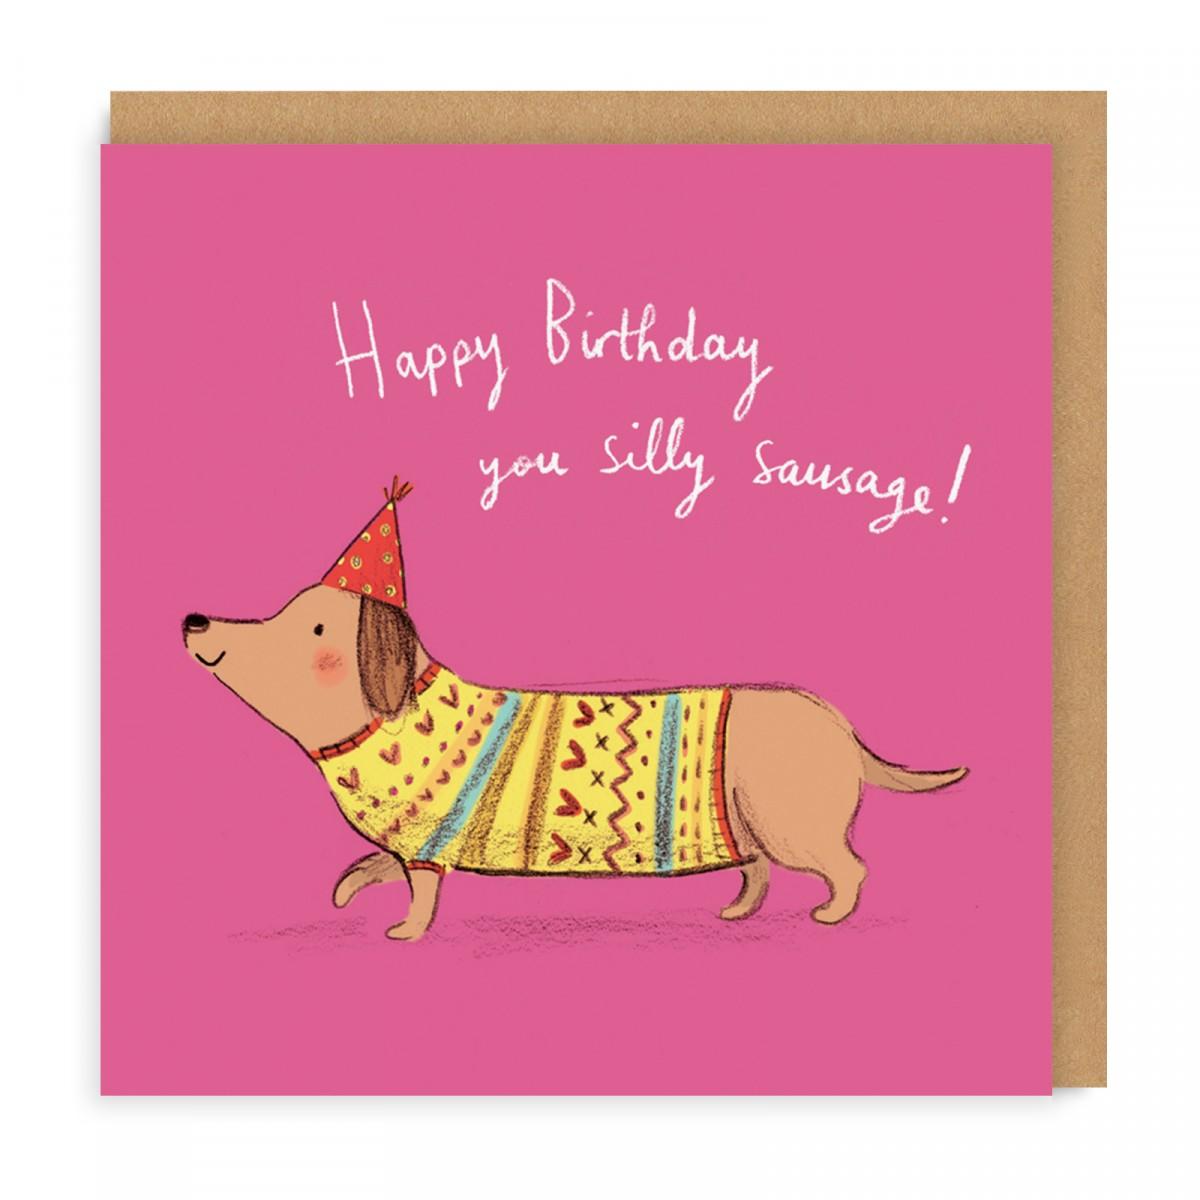 rcm-gc-012-sq_happy_birthday_silly_sausage_1.jpg